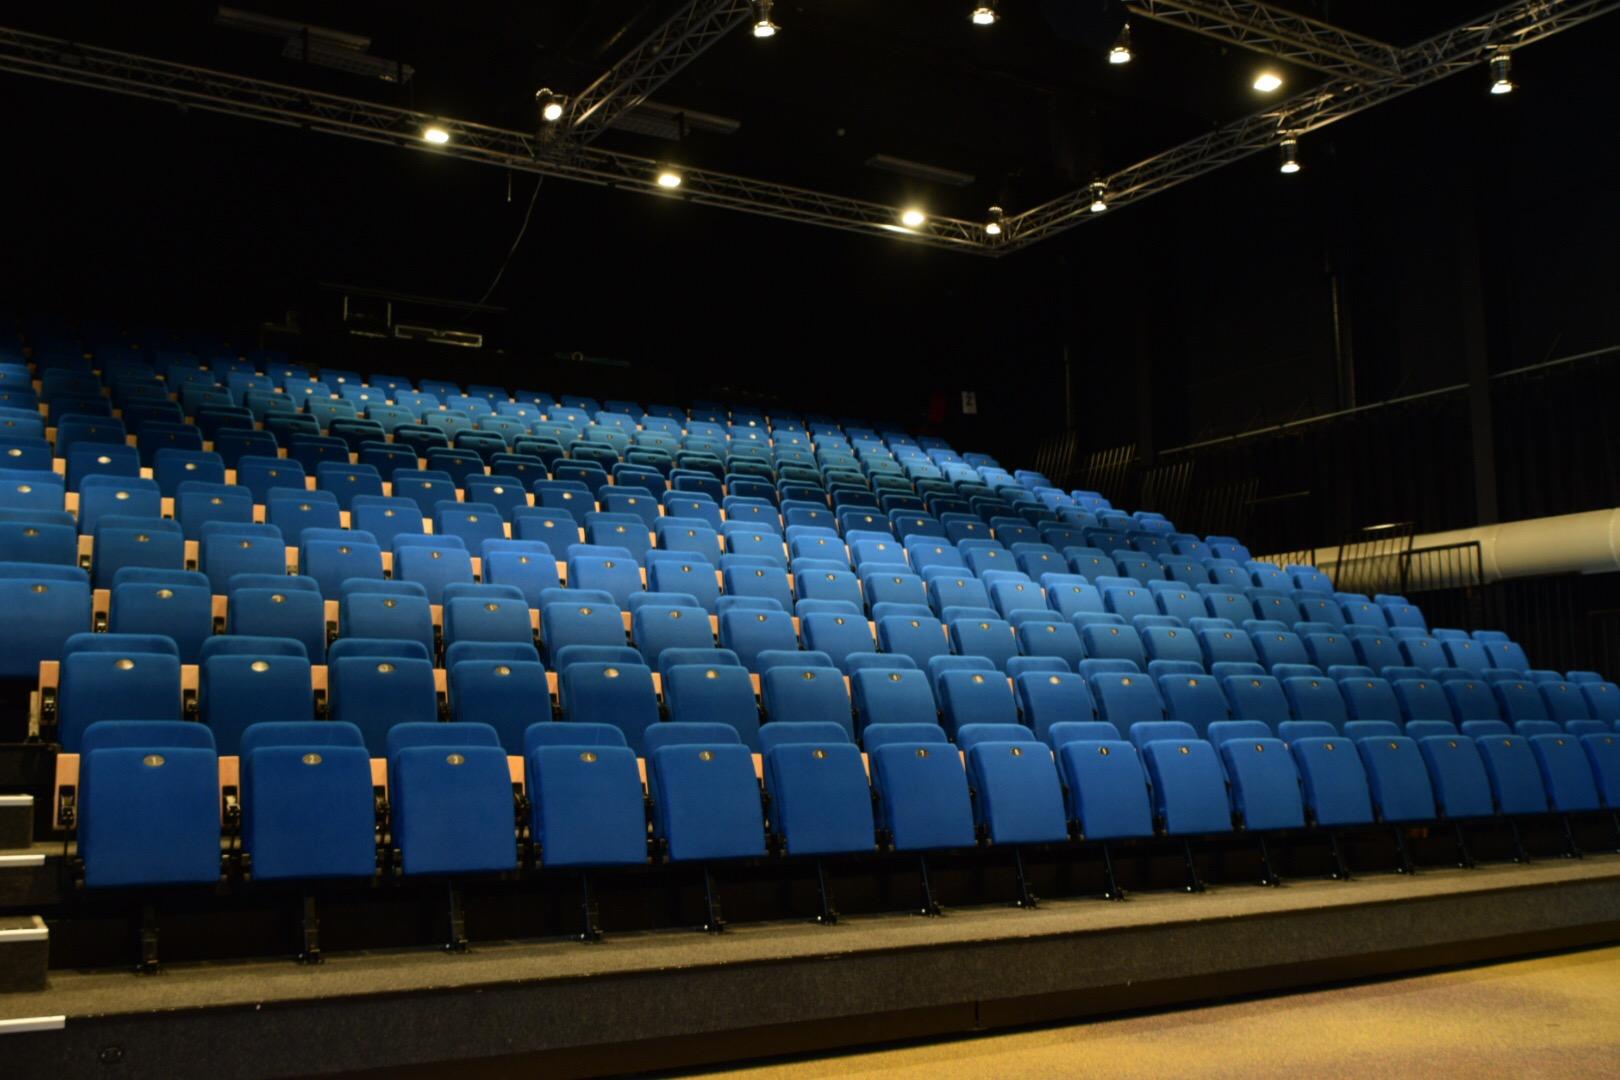 Moza 207 Ek Theater Wijchen Mobelli Contract Seating